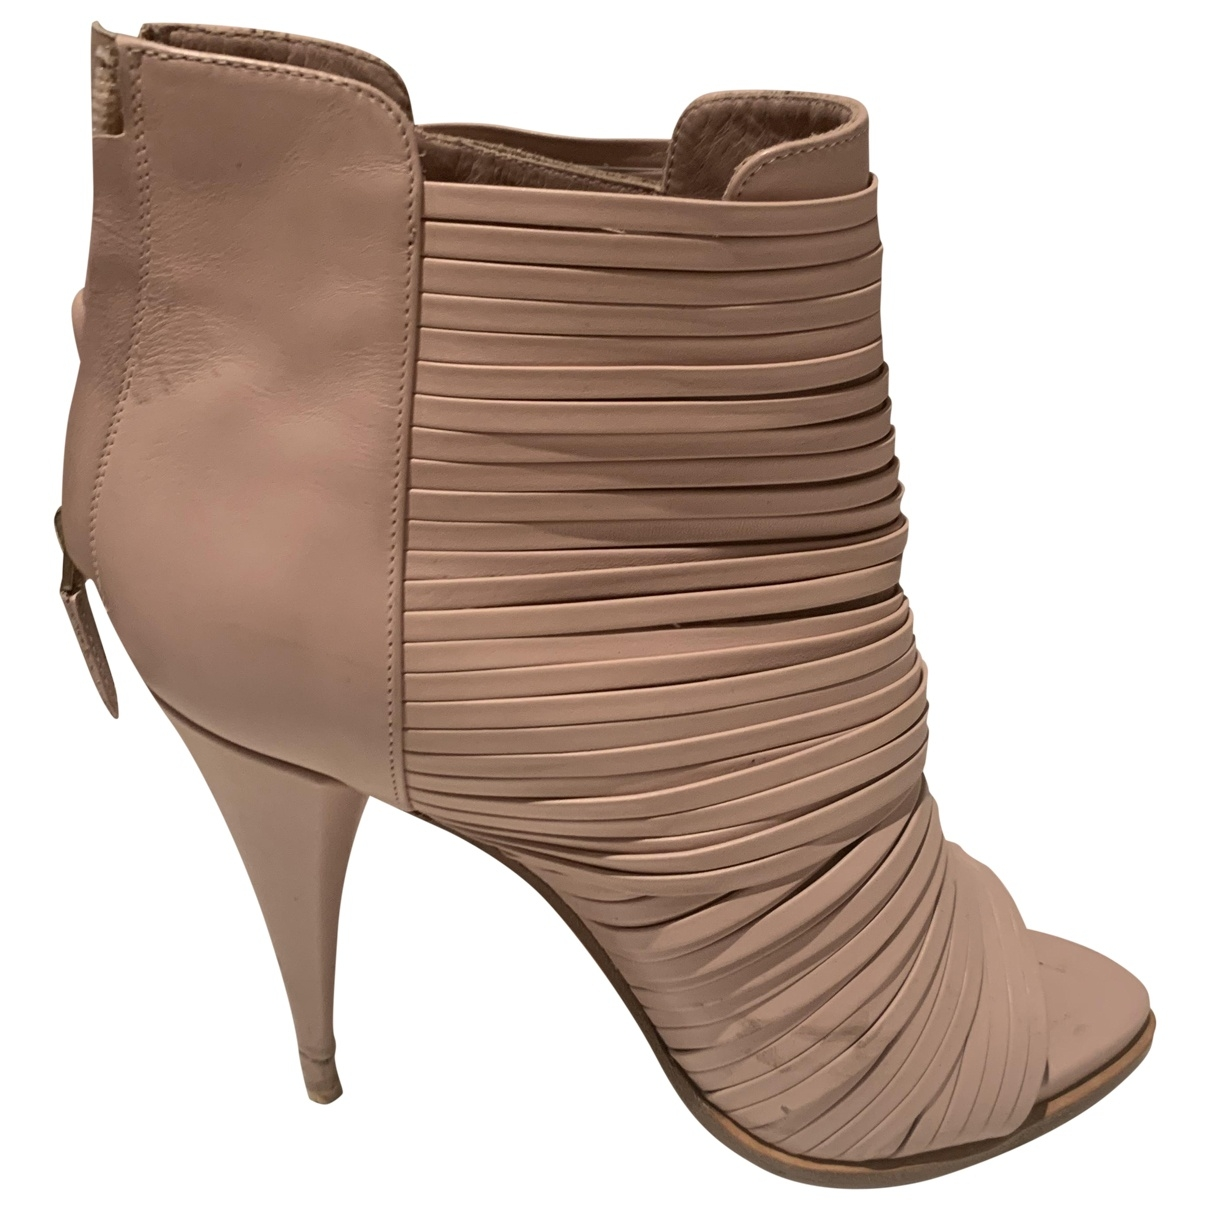 Botas open toe de Cuero Givenchy